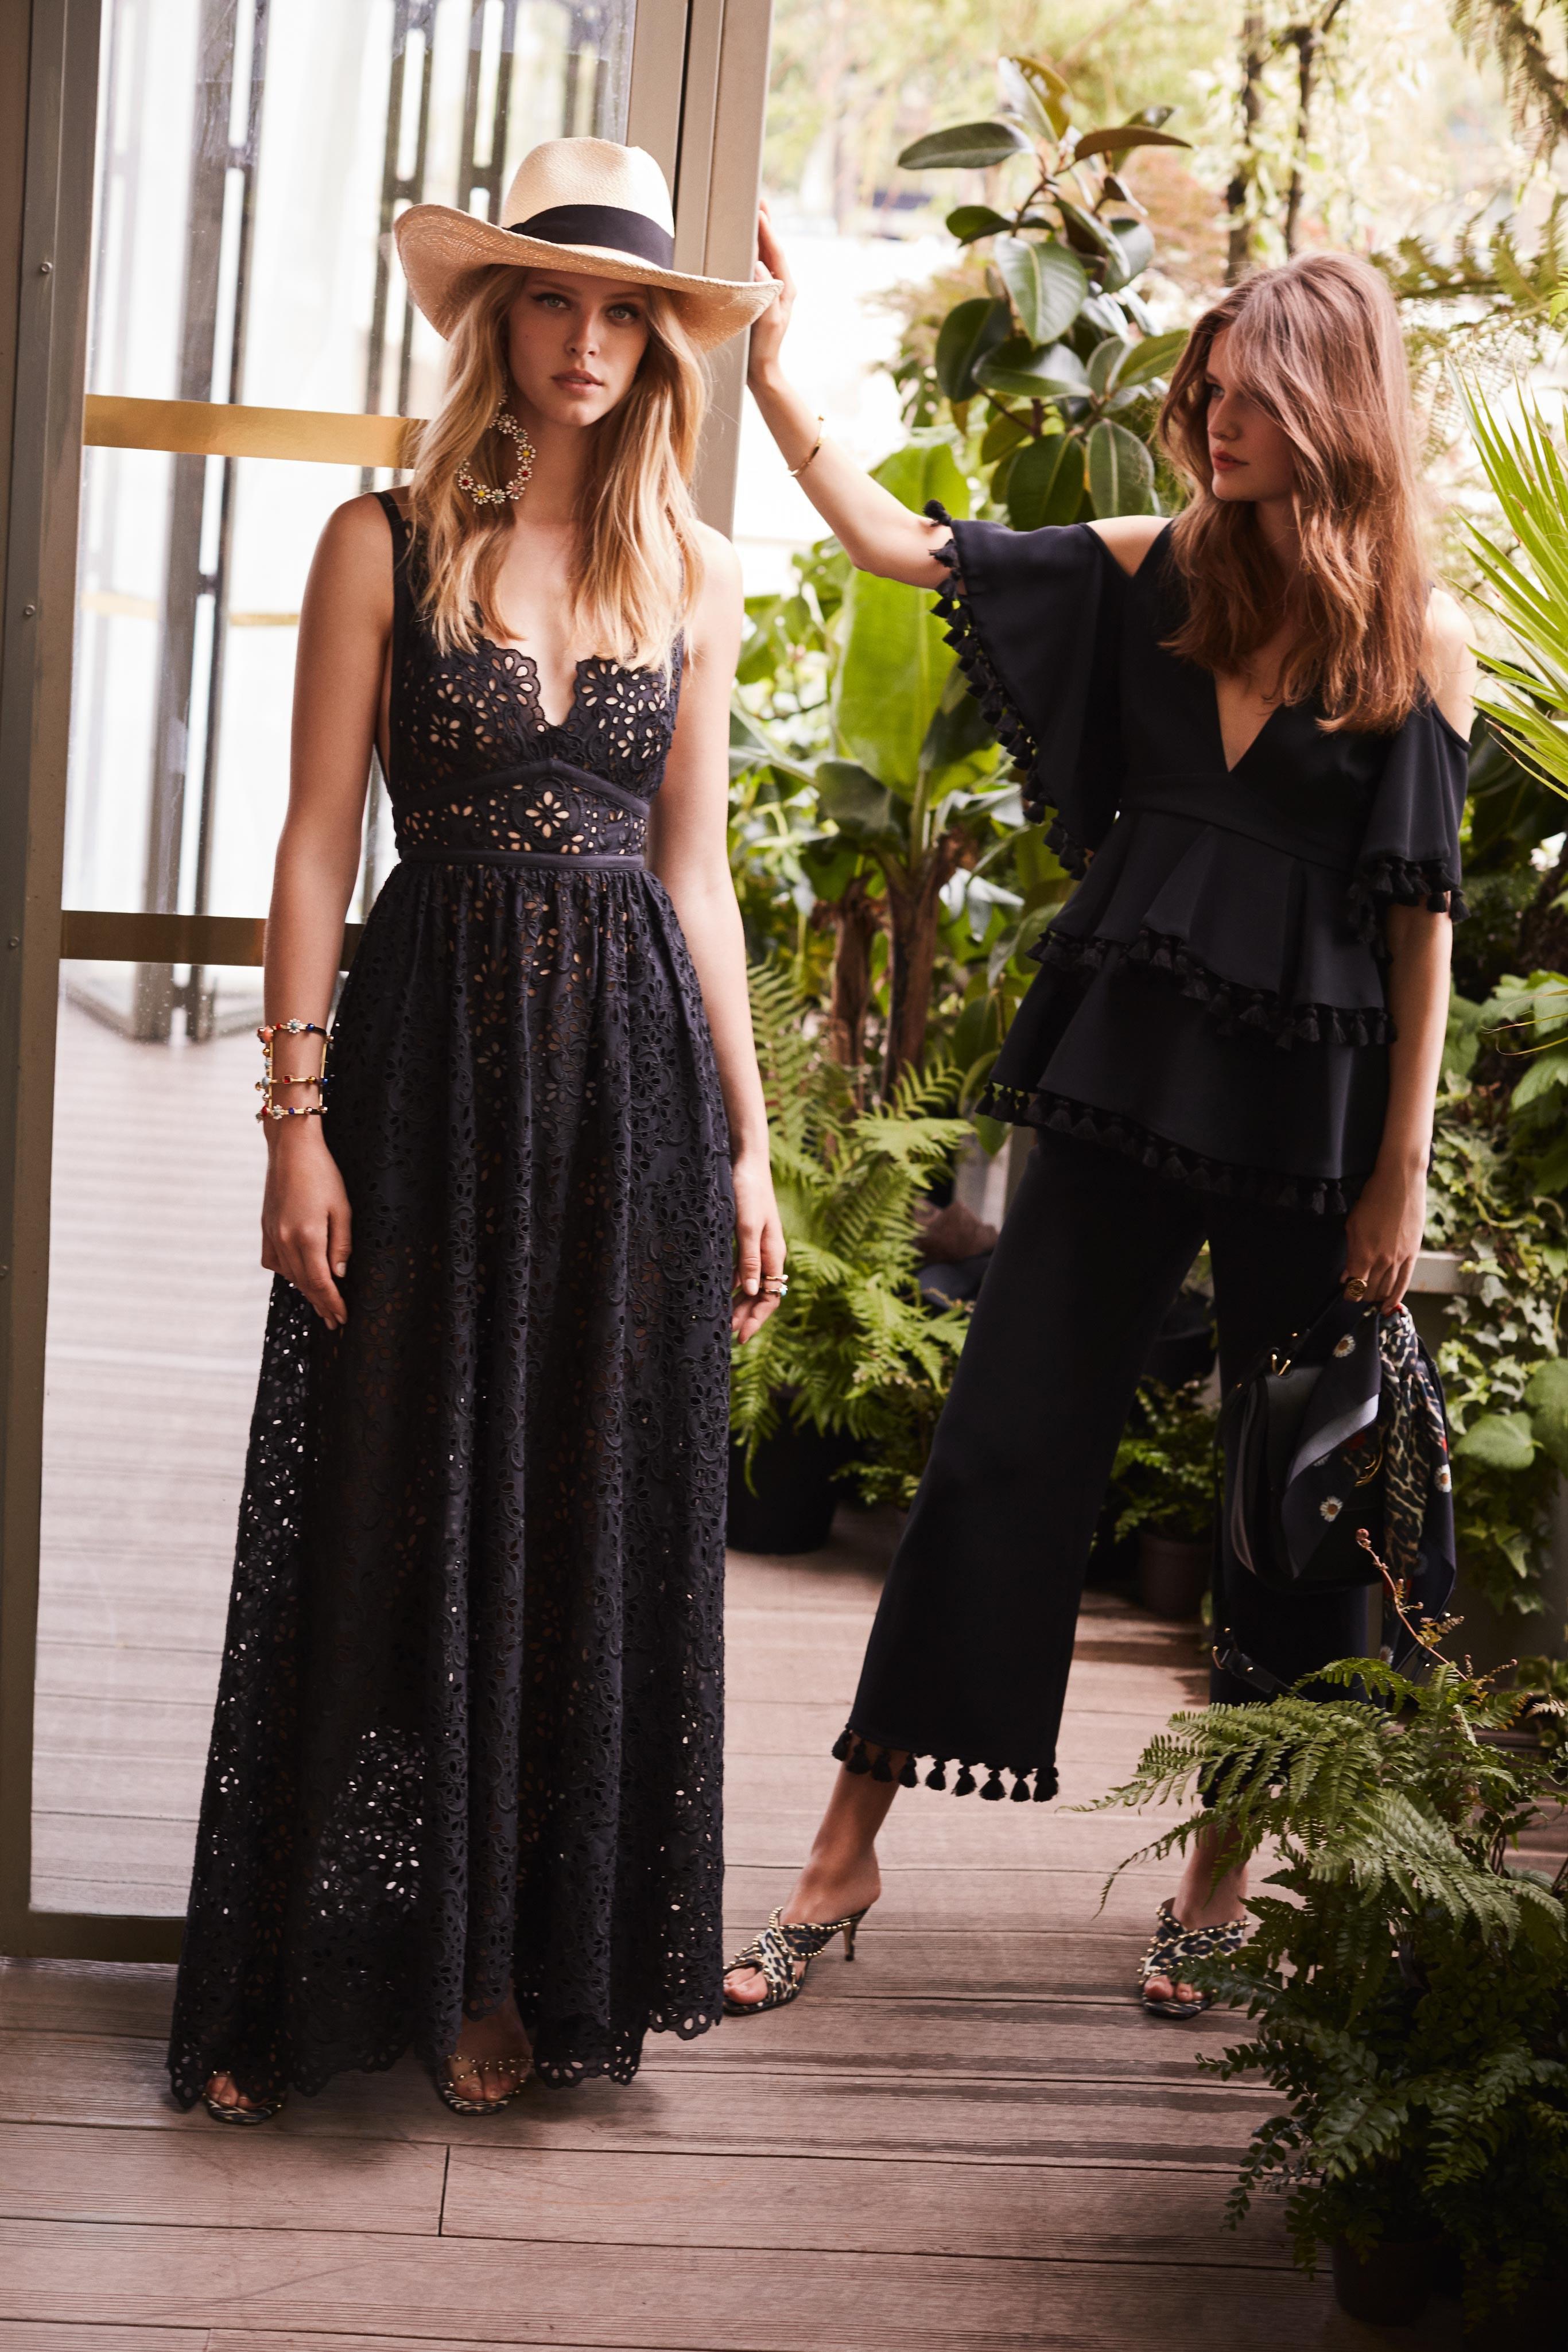 00015-Elie-Saab-Vogue-Resort-2019-pr